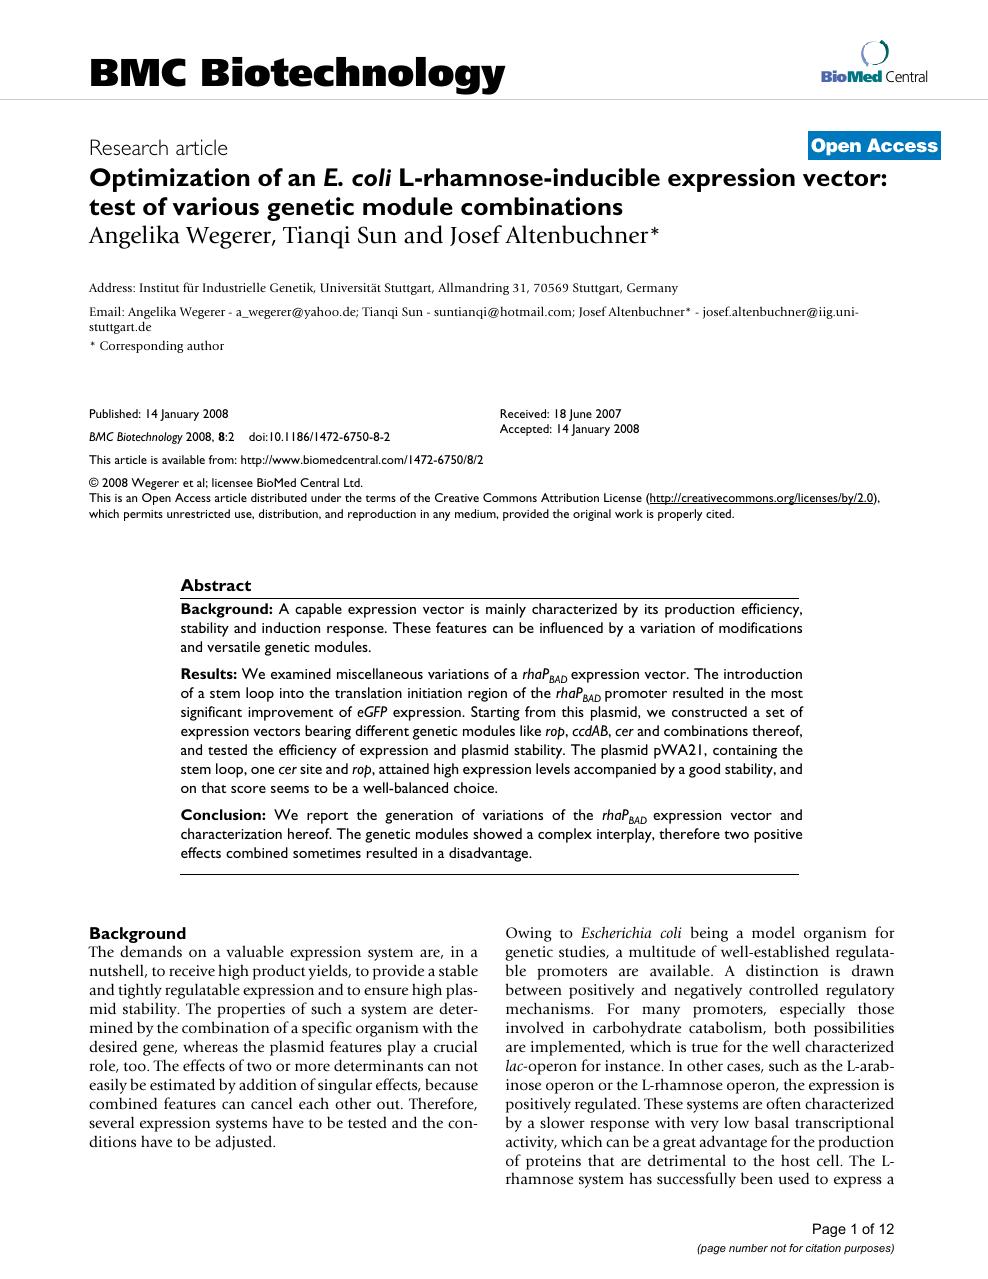 Optimization Of An E Coli L Rhamnose Inducible Expression